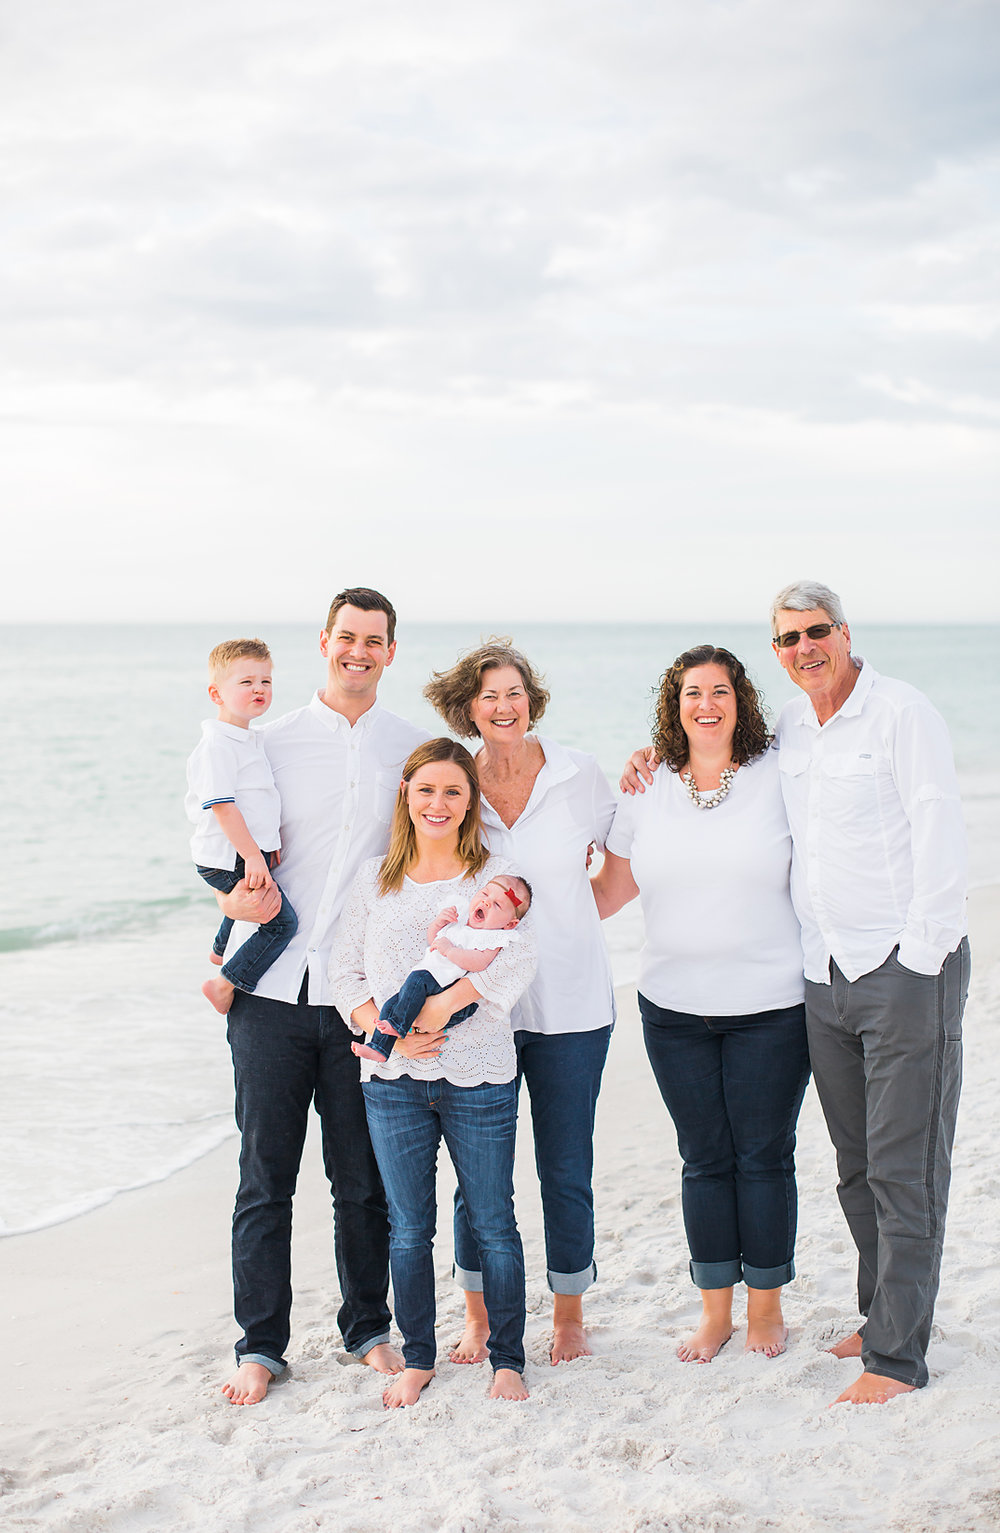 Mulder Family Vacation Photos 2018 - Anna Maria Island Family Photographer - Emily & Co. Photography (6).jpg